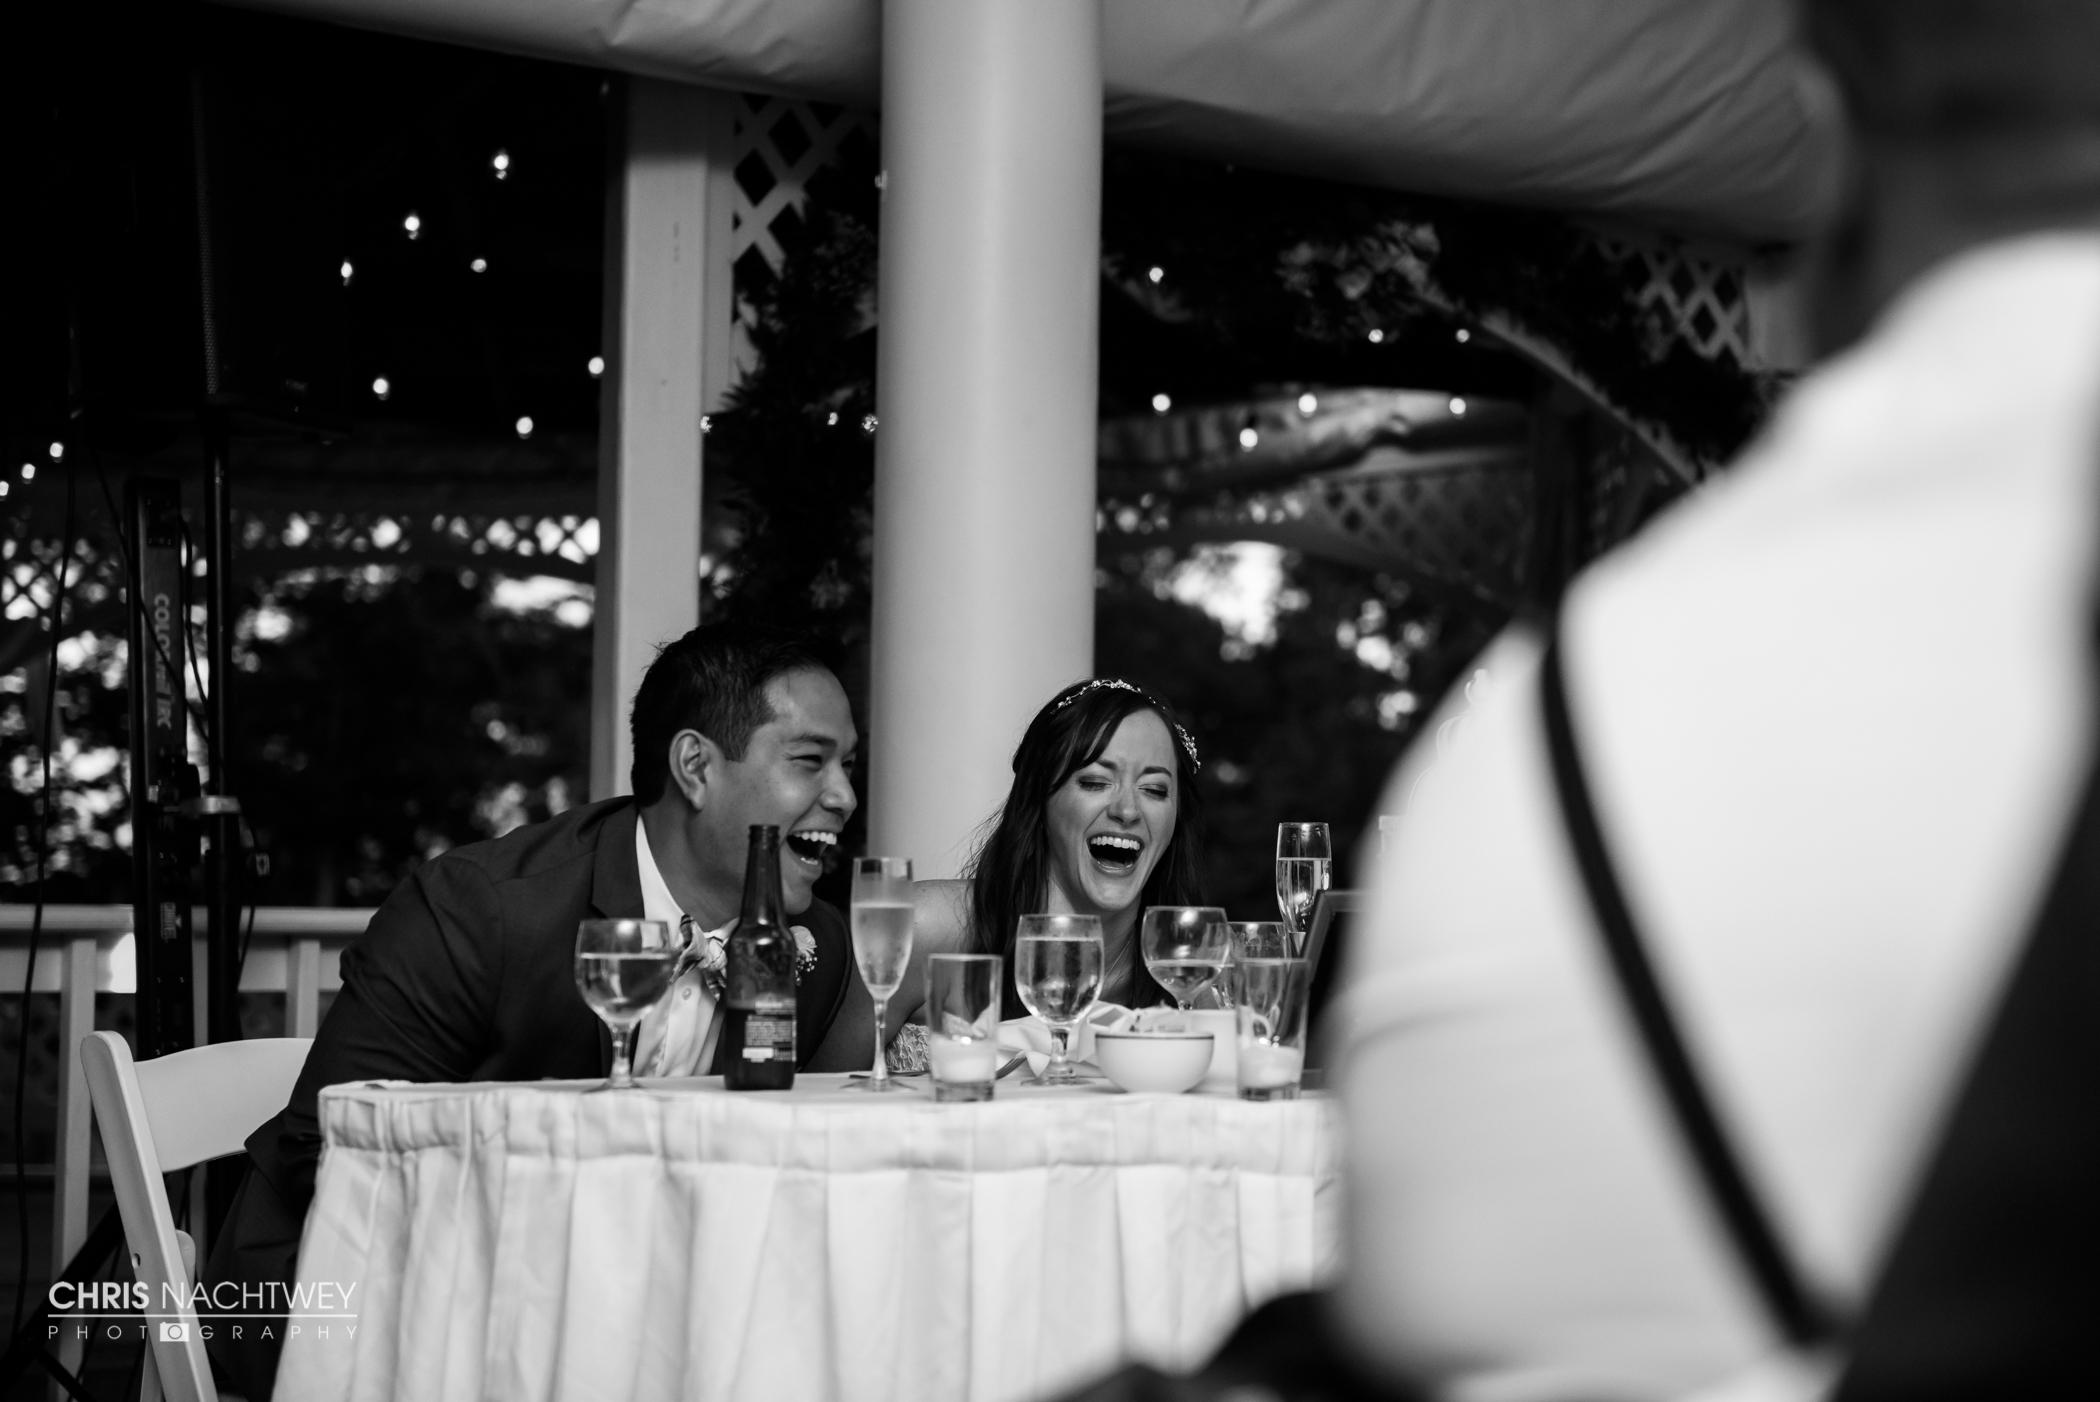 inn-at-mystic-connecticut-wedding-photographer-chris-nachtwey-29.jpg